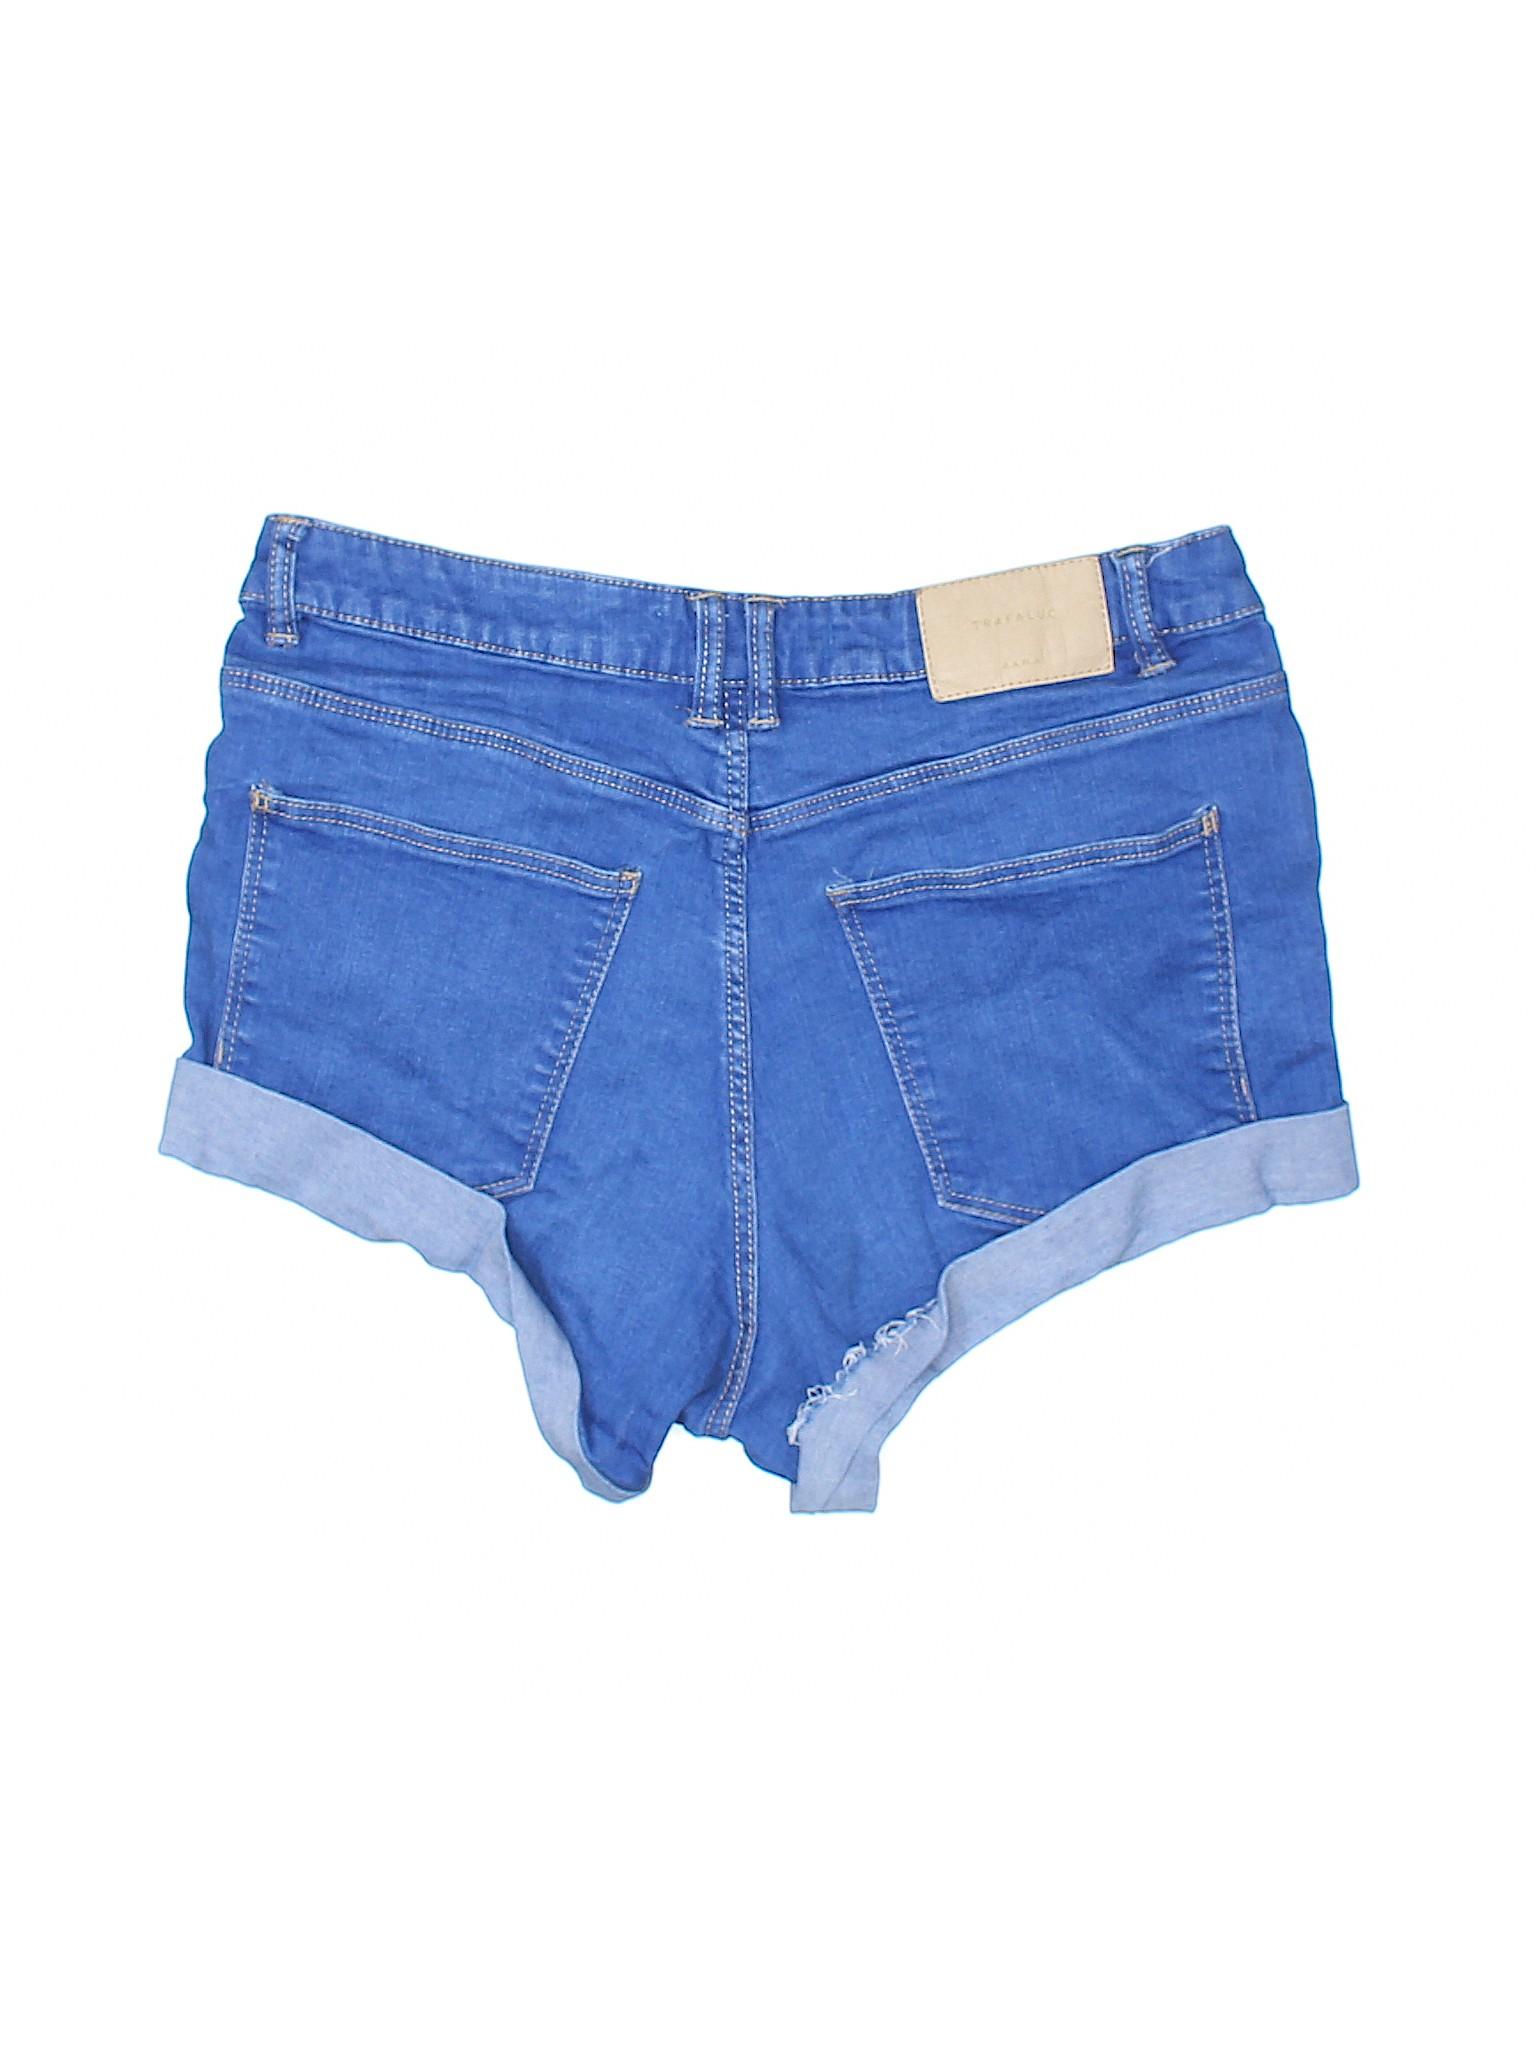 Shorts Boutique Denim Denim Shorts Zara Zara Denim Shorts Zara Denim Zara Boutique Boutique Boutique HqUfnwpCpd